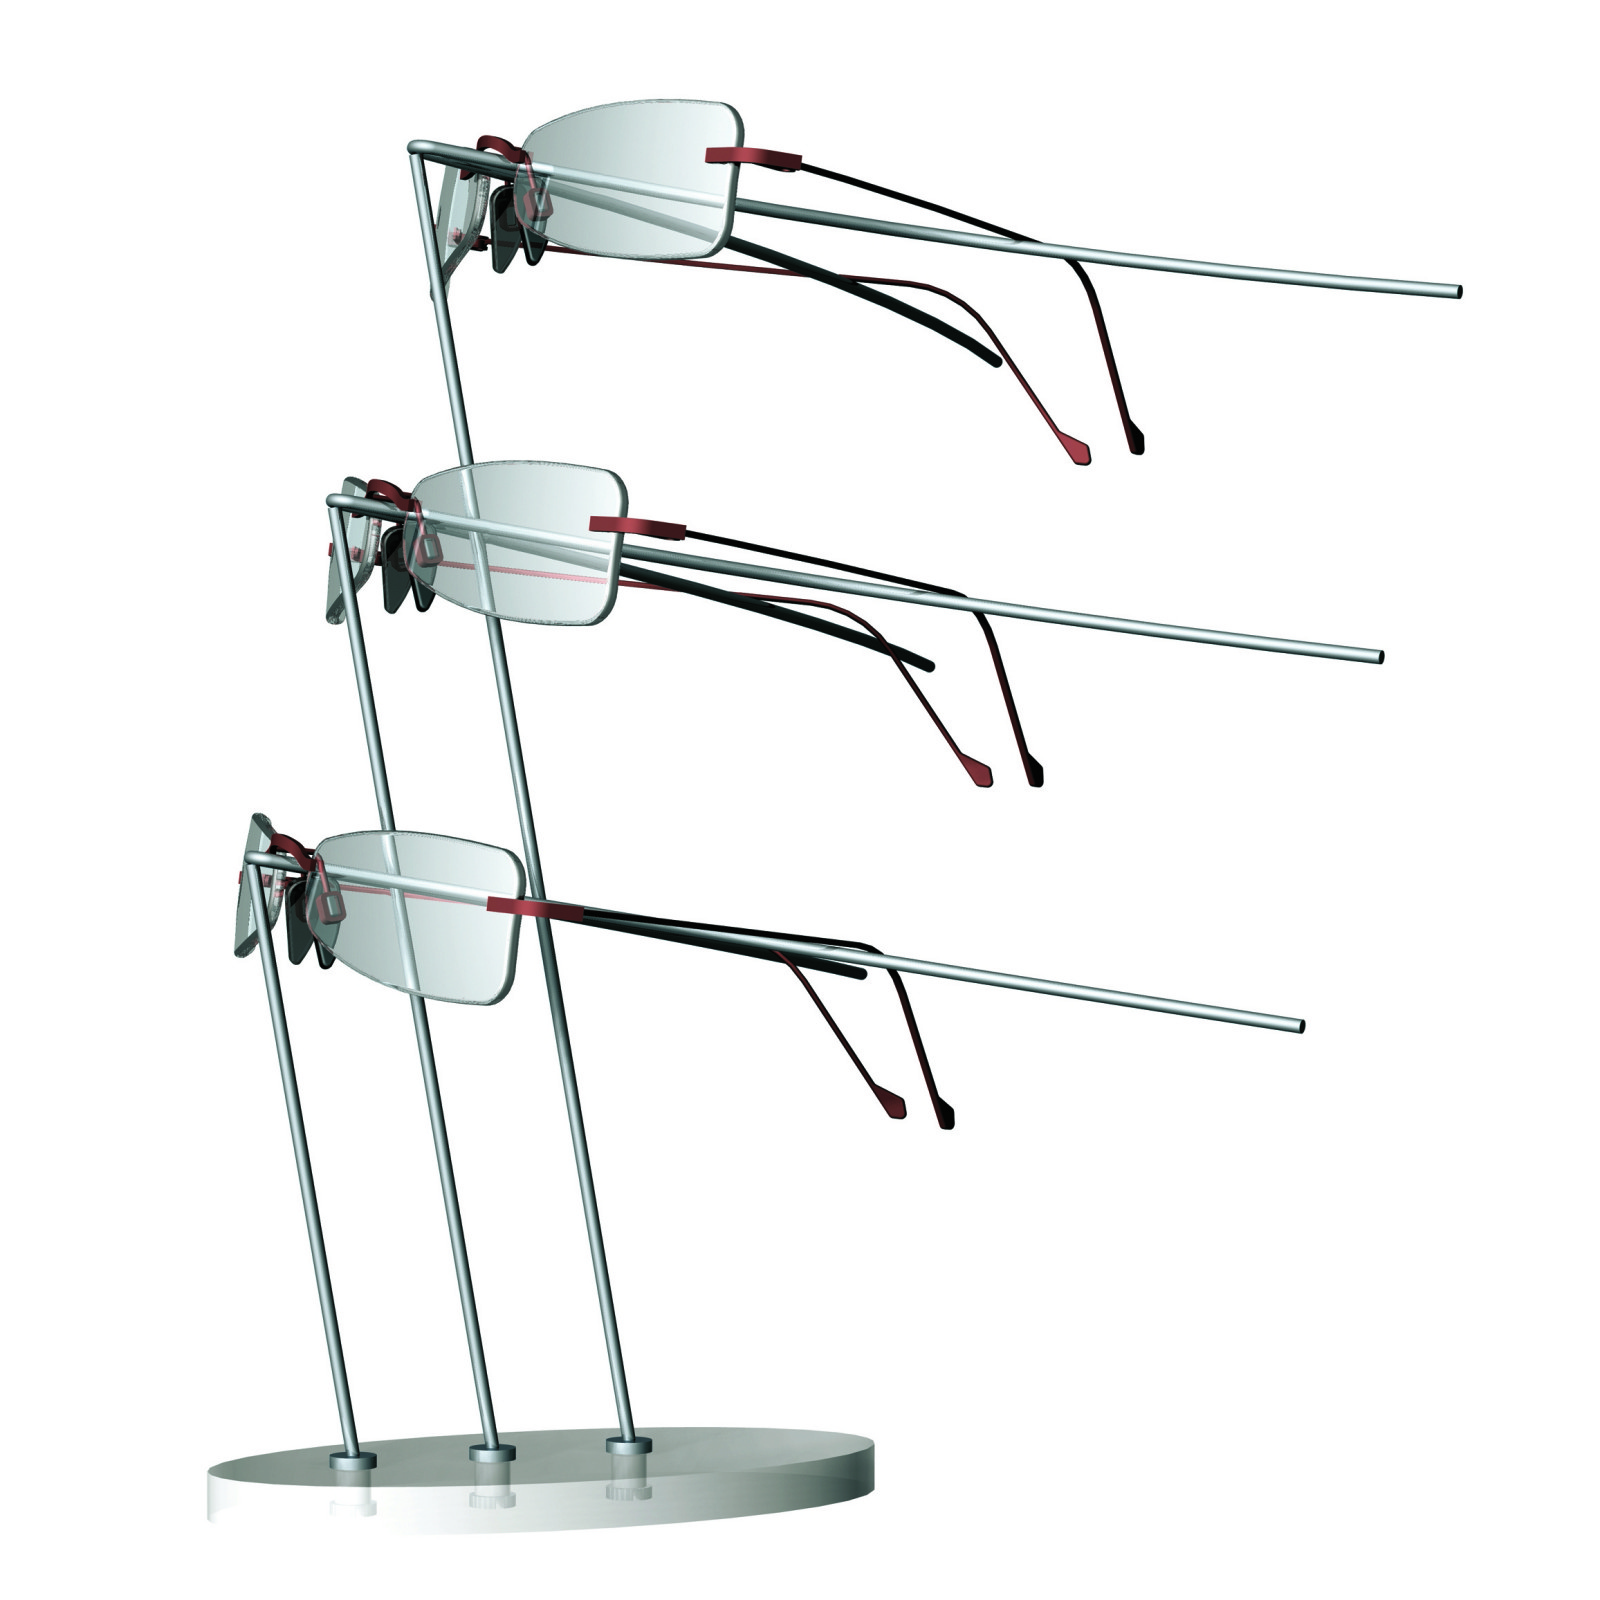 PLANE, decorative frame holder for 3 frames - Mewscraft